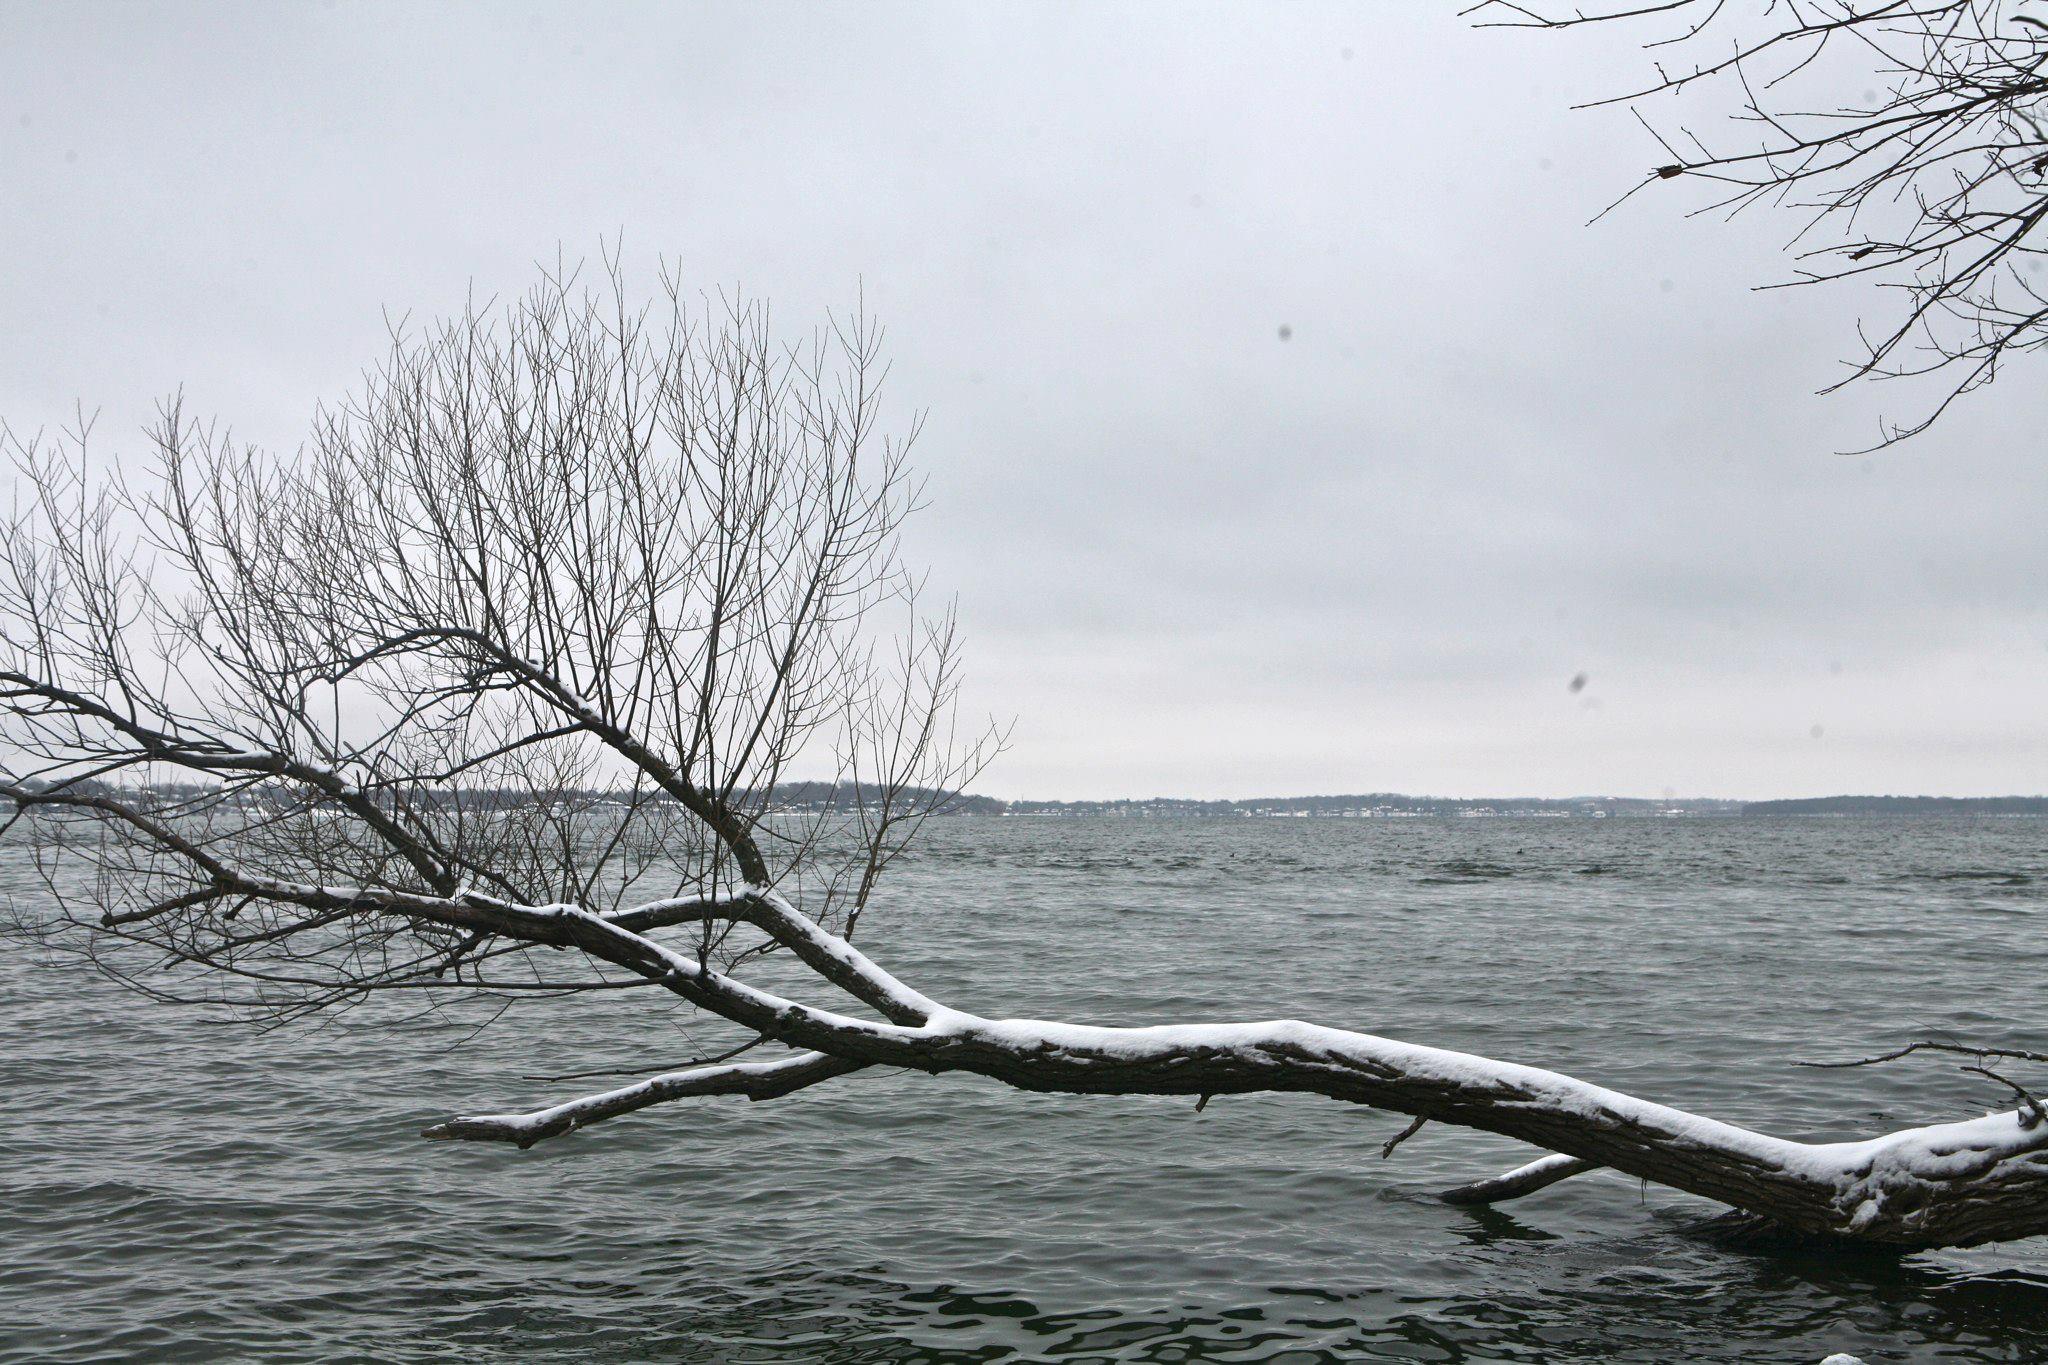 Lean Branch